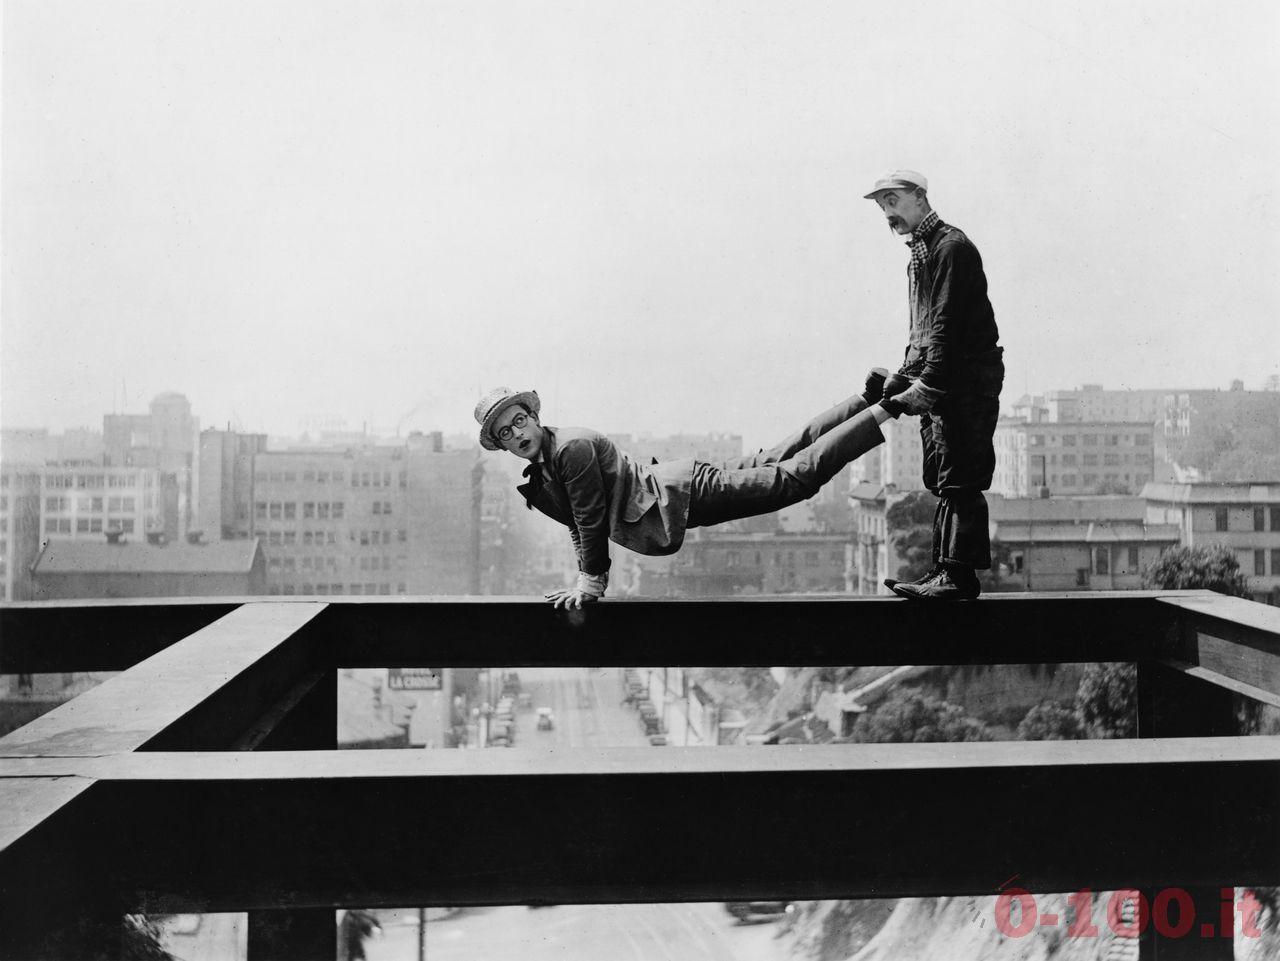 mechanics-of-dreams-girard-perregaux-sinan-mansion-academy-museum-of-motion-pictures_Lloyd_HarrySnubPollard_LOOKOUTBELOW1919_0-100